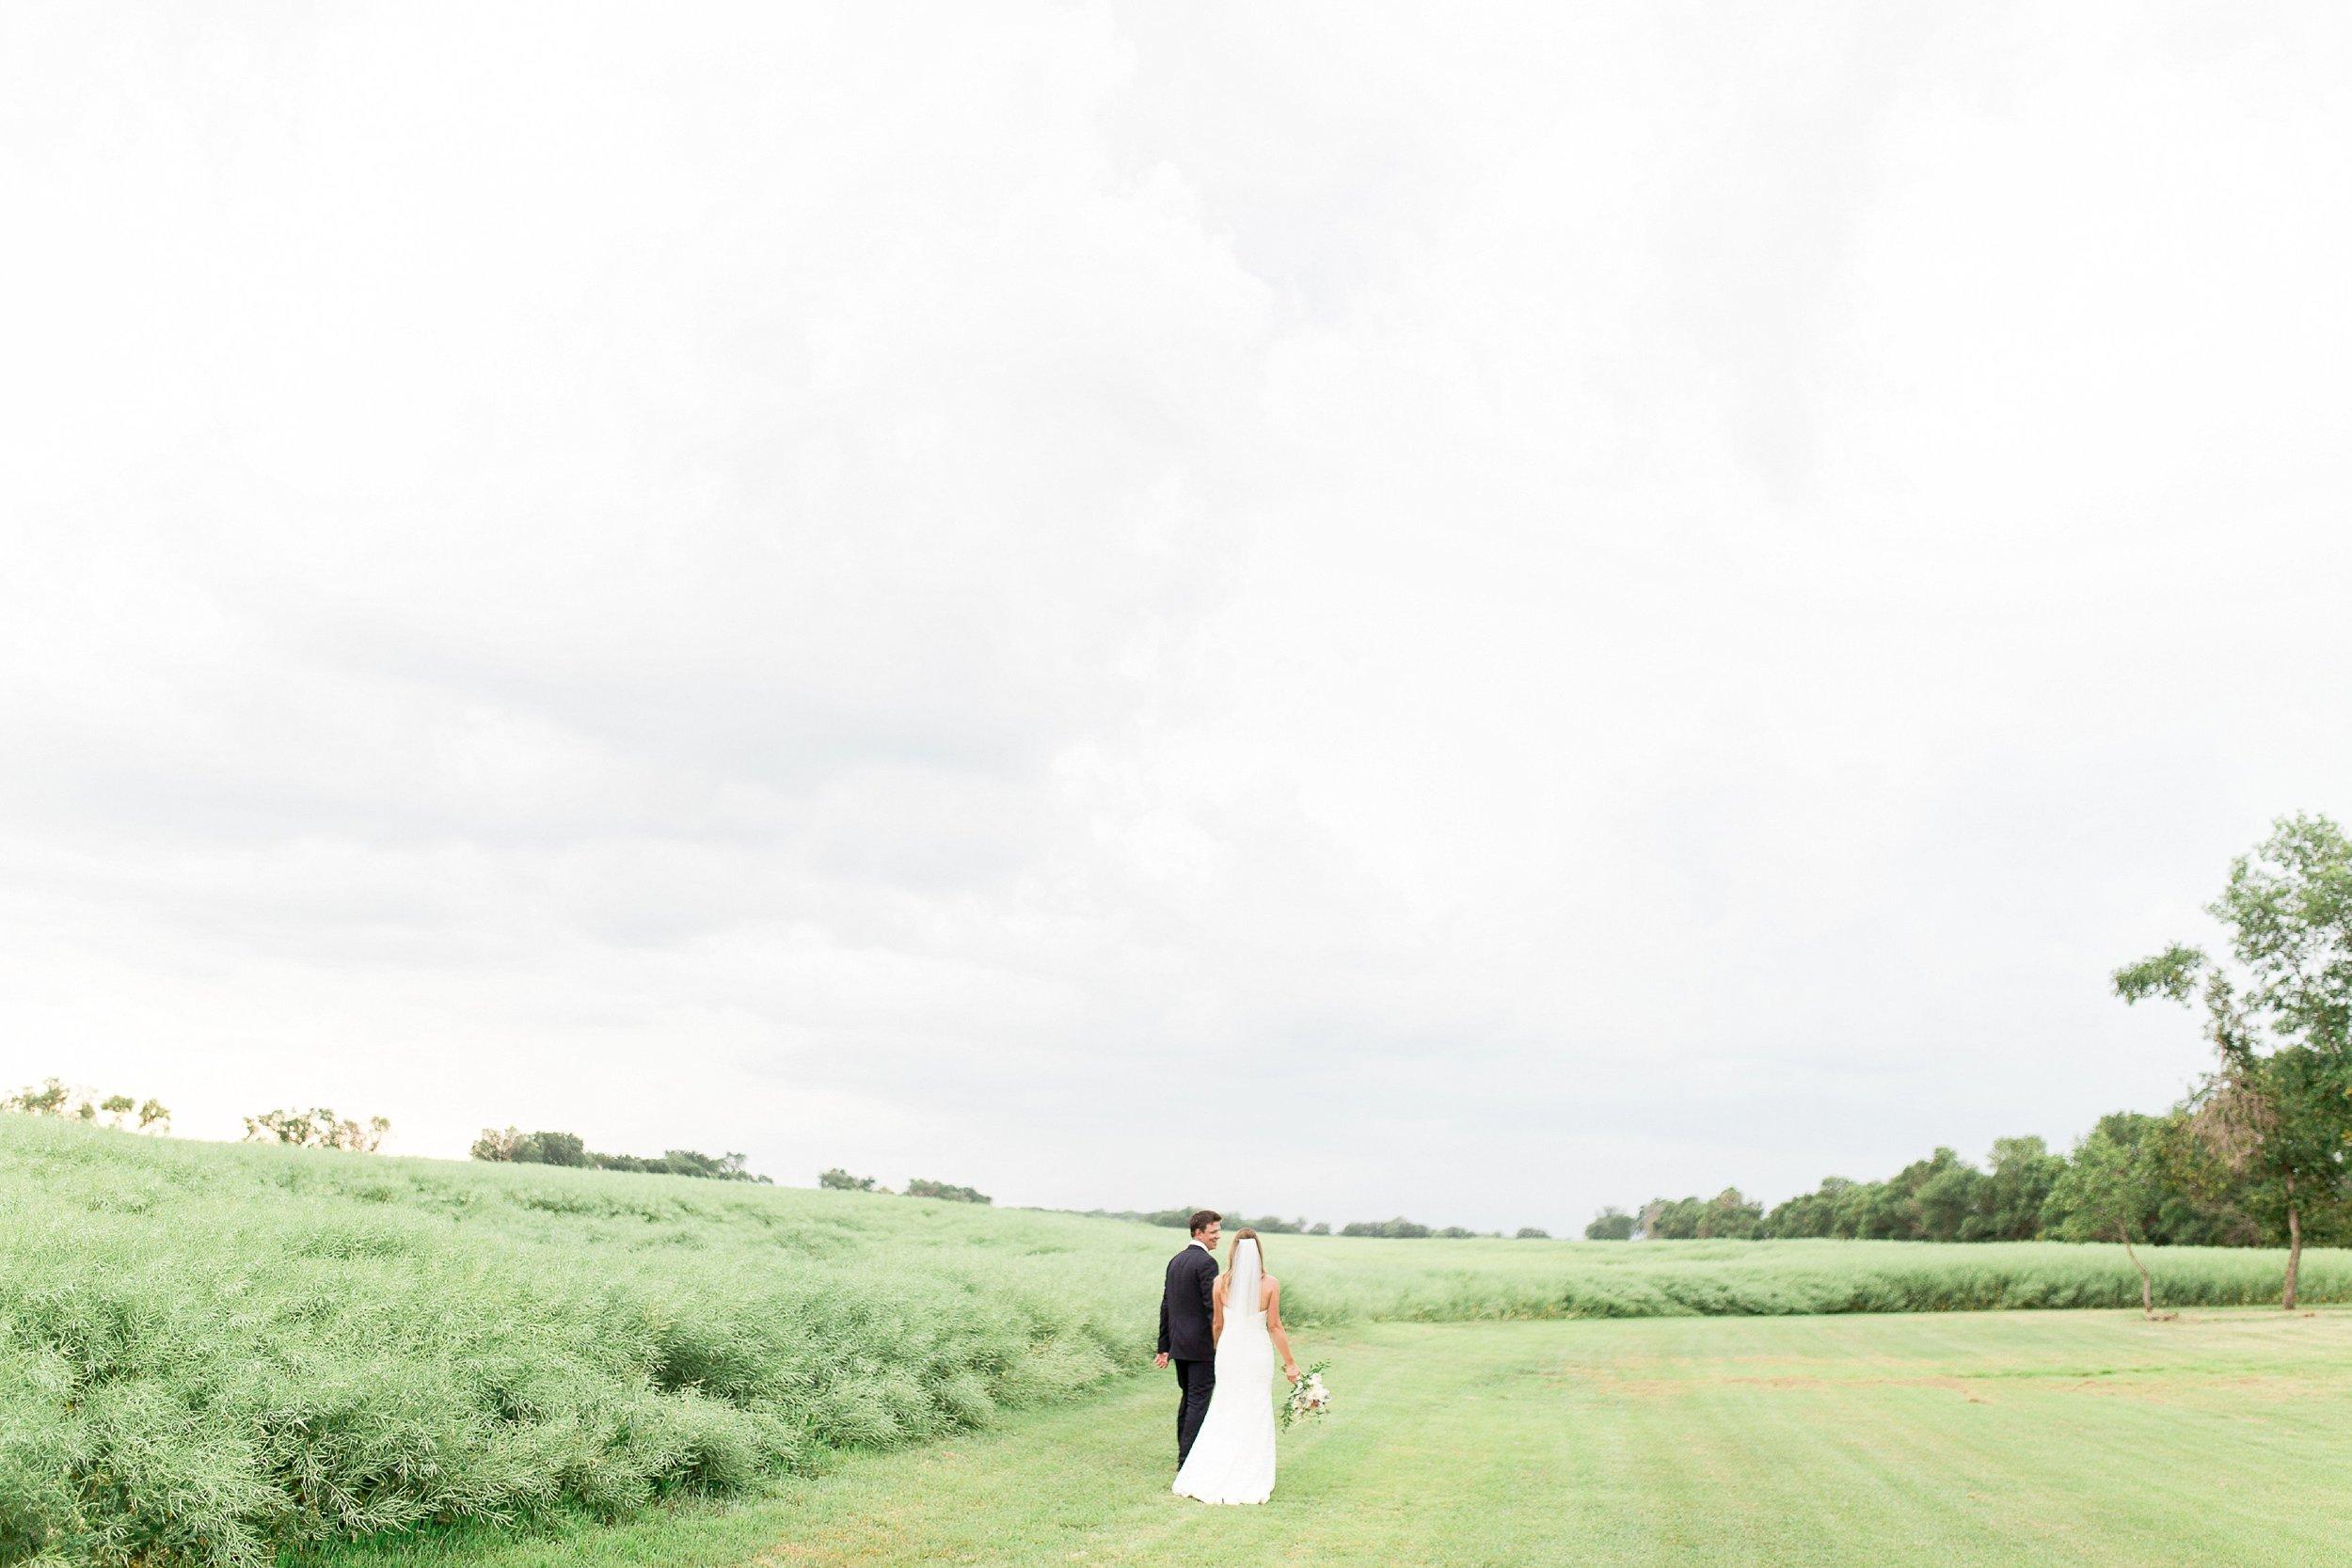 Toronto wedding photographer   Keila Marie Photography   Bride and groom portraits  Garden inspired wedding